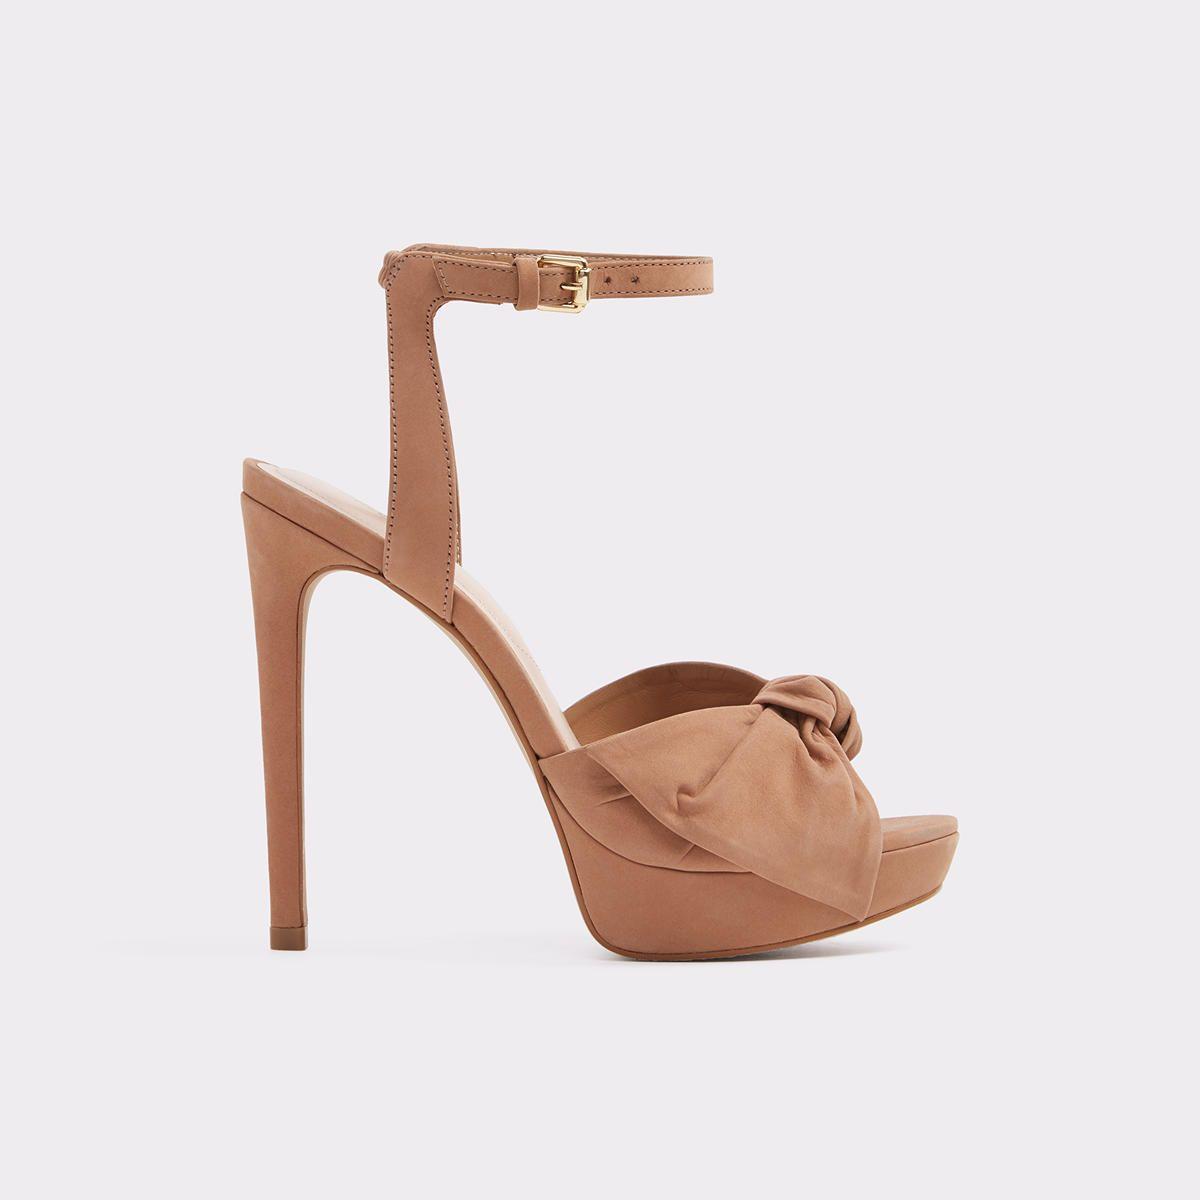 6292cc3790538 Sublimity A knotted bow enhances the feminine essence of an ankle-strap  sandal